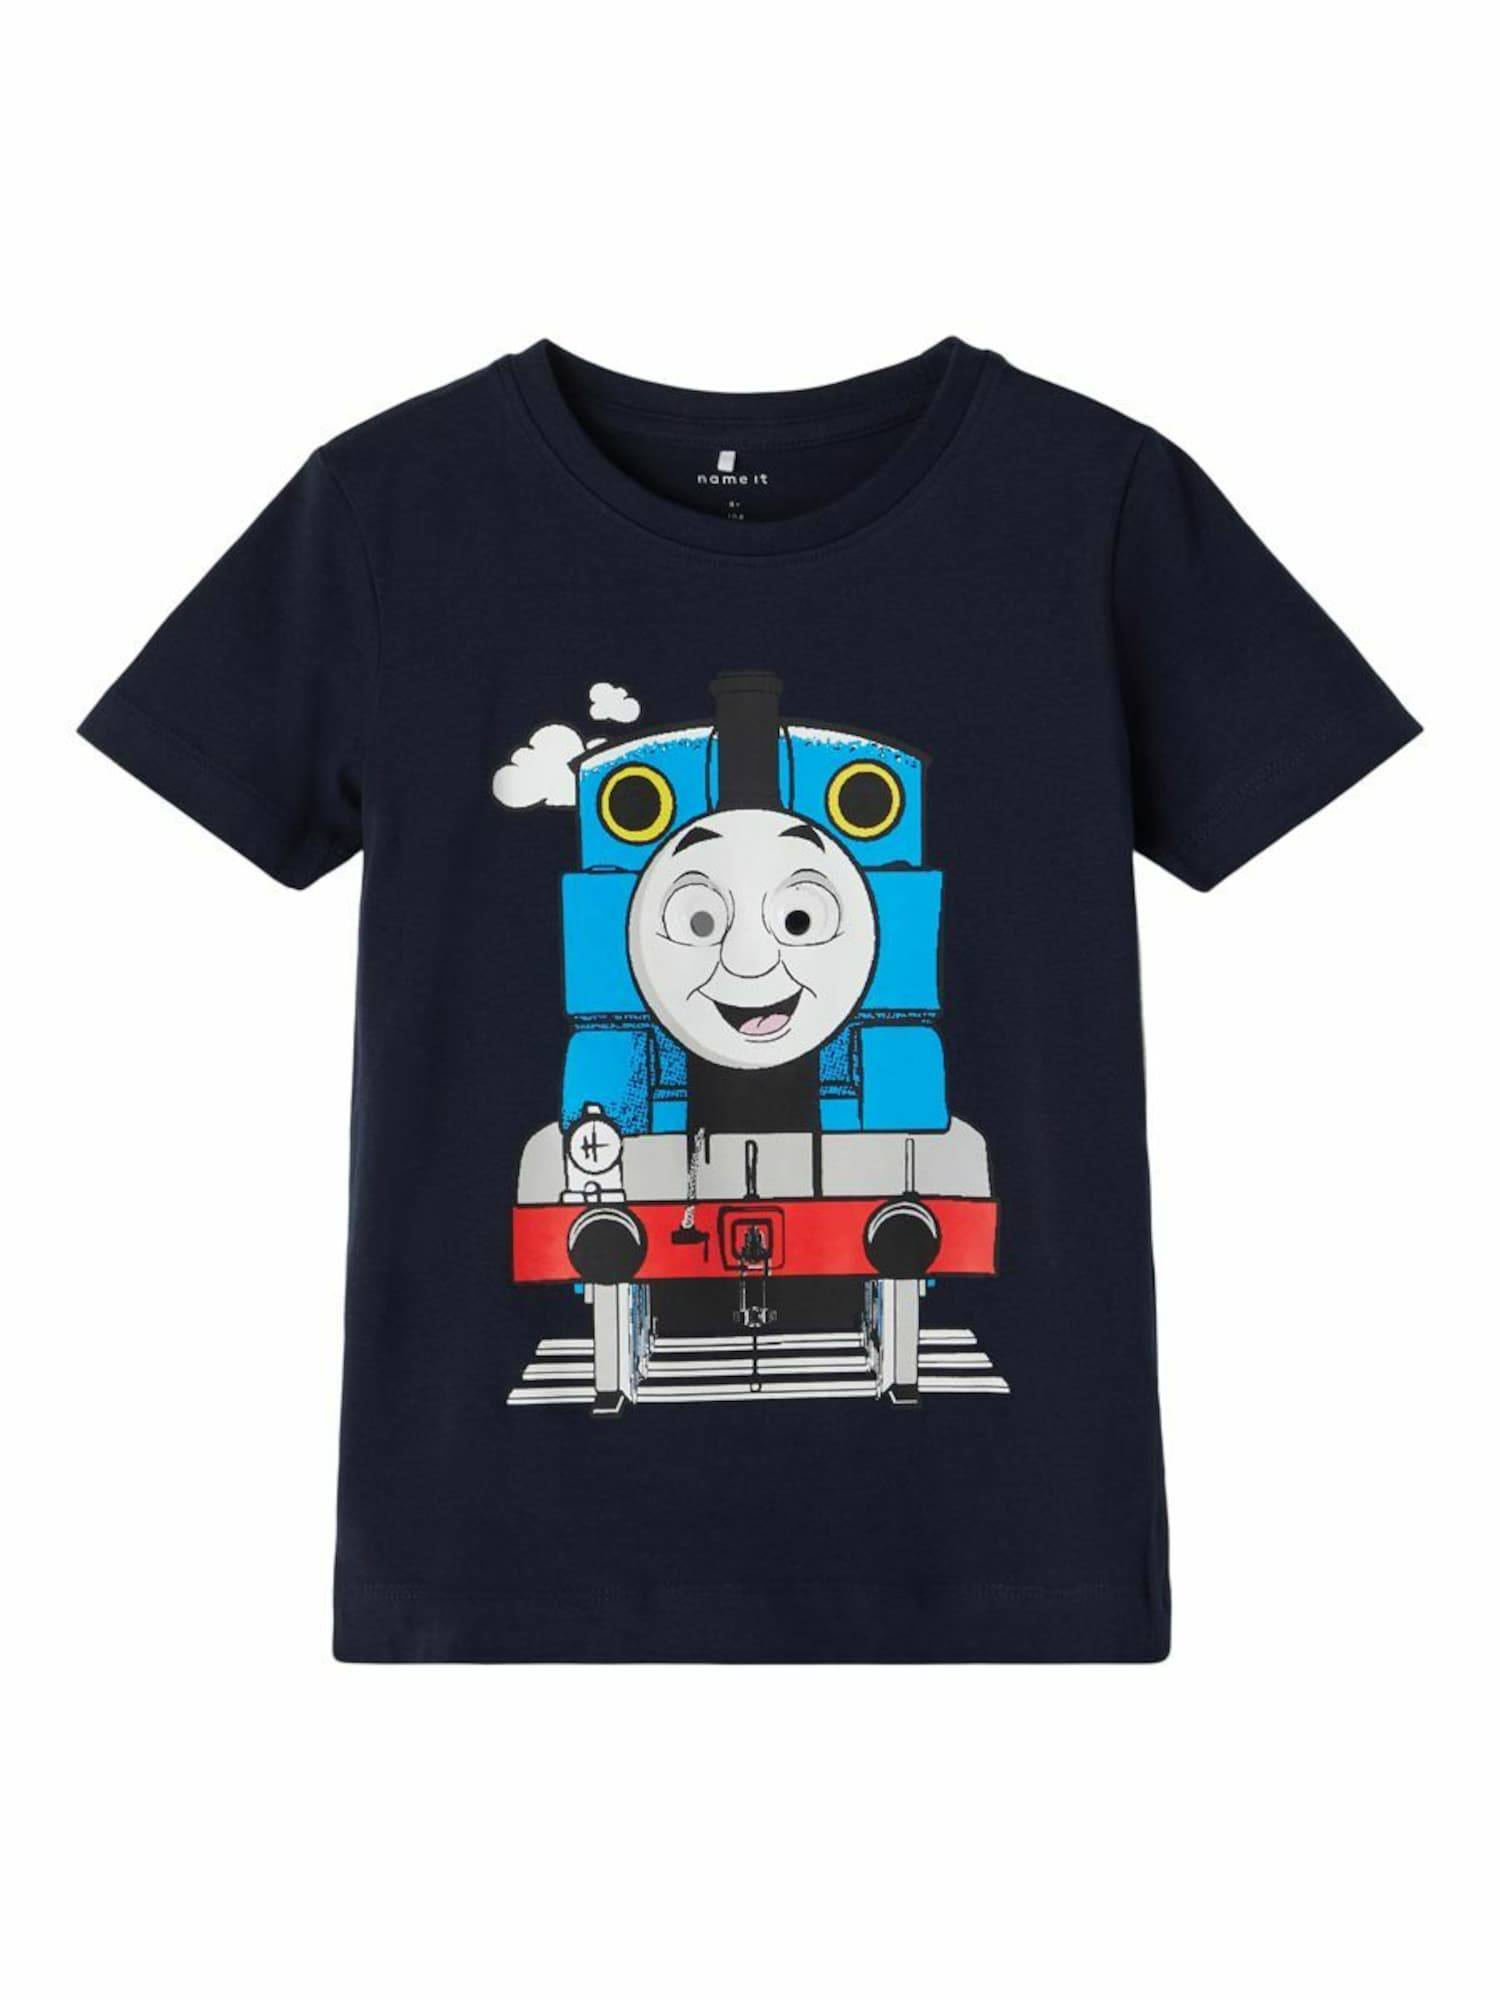 NAME IT T-Shirt 'Thomas Train'  - Bleu - Taille: 110 - boy